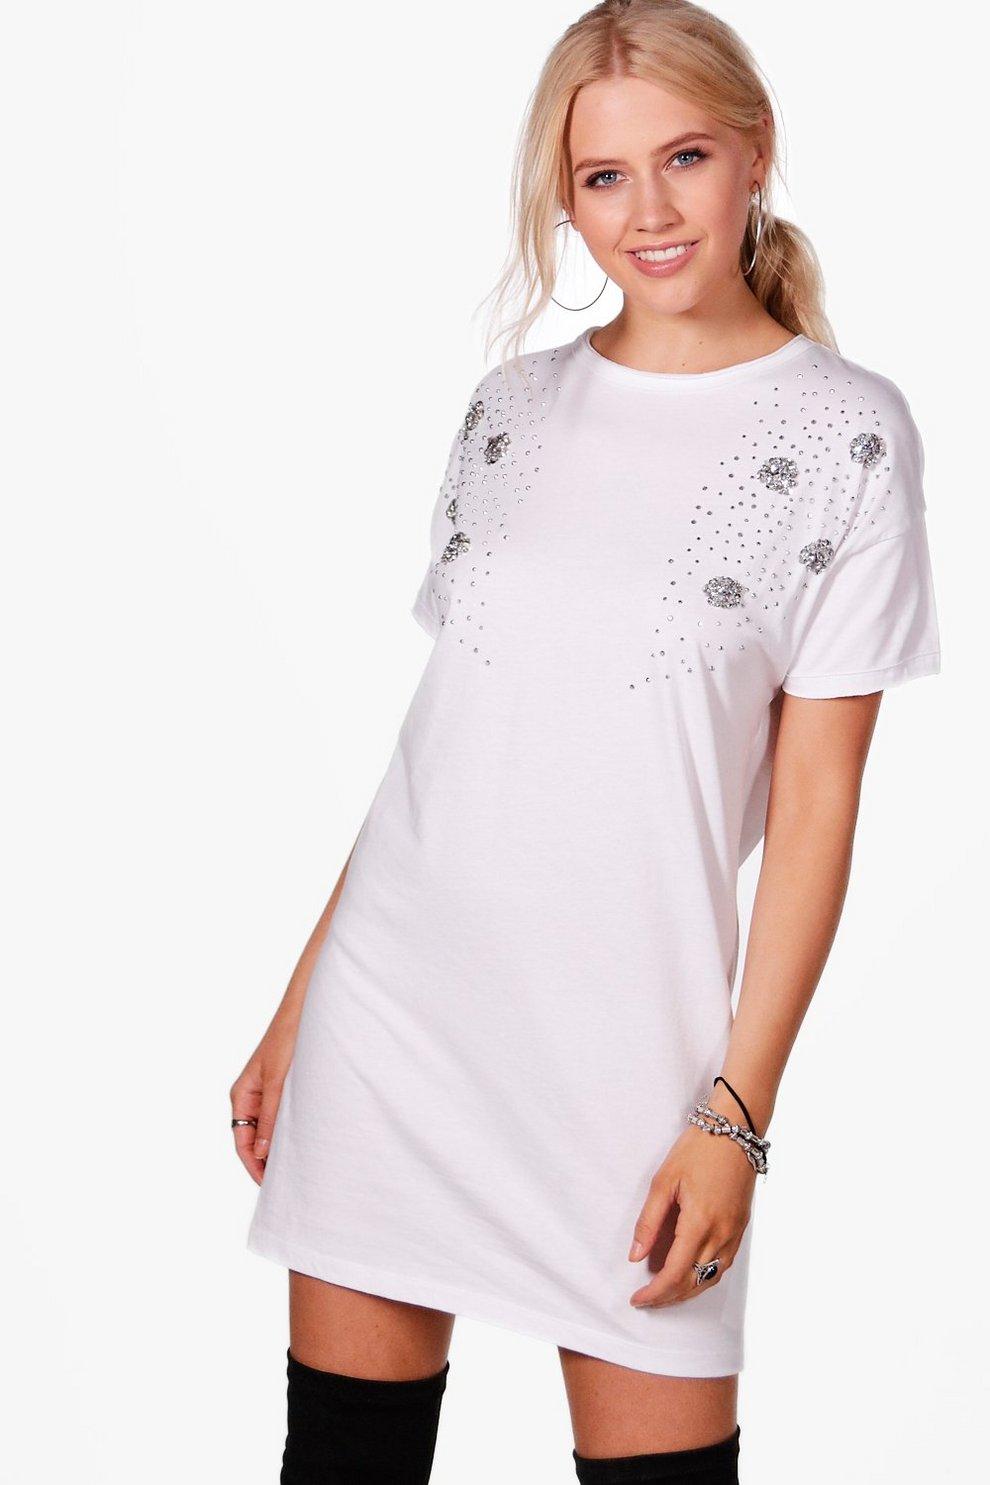 b2383fabfdf Womens White Nora Embellished T-shirt Dress